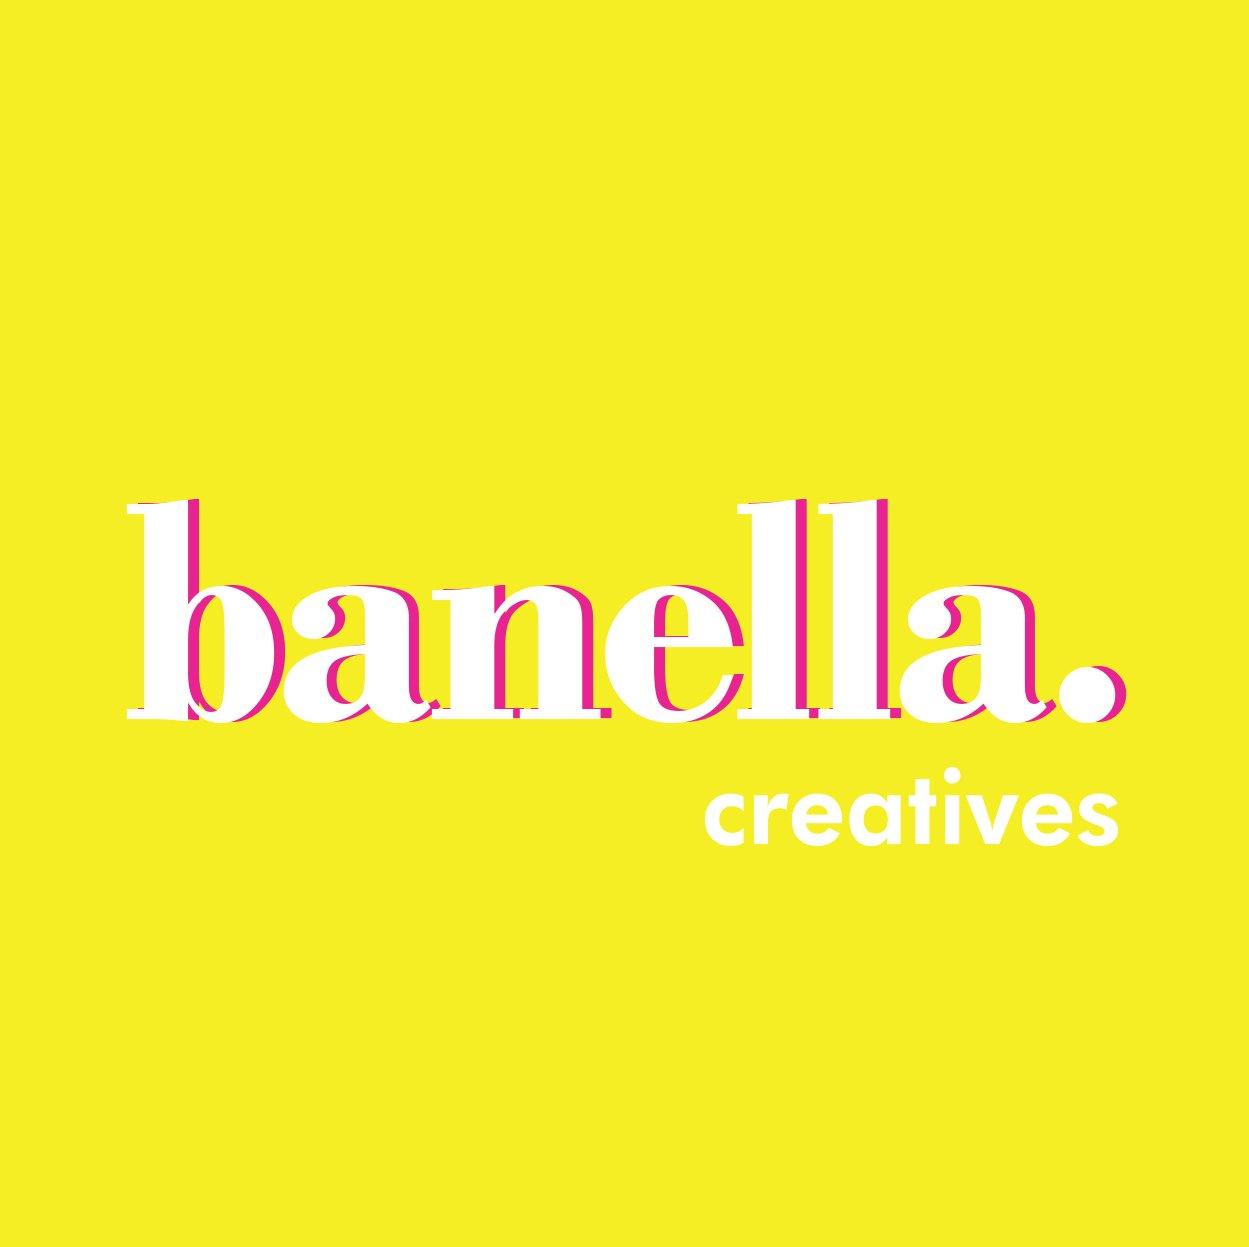 Professional Logo Creation services